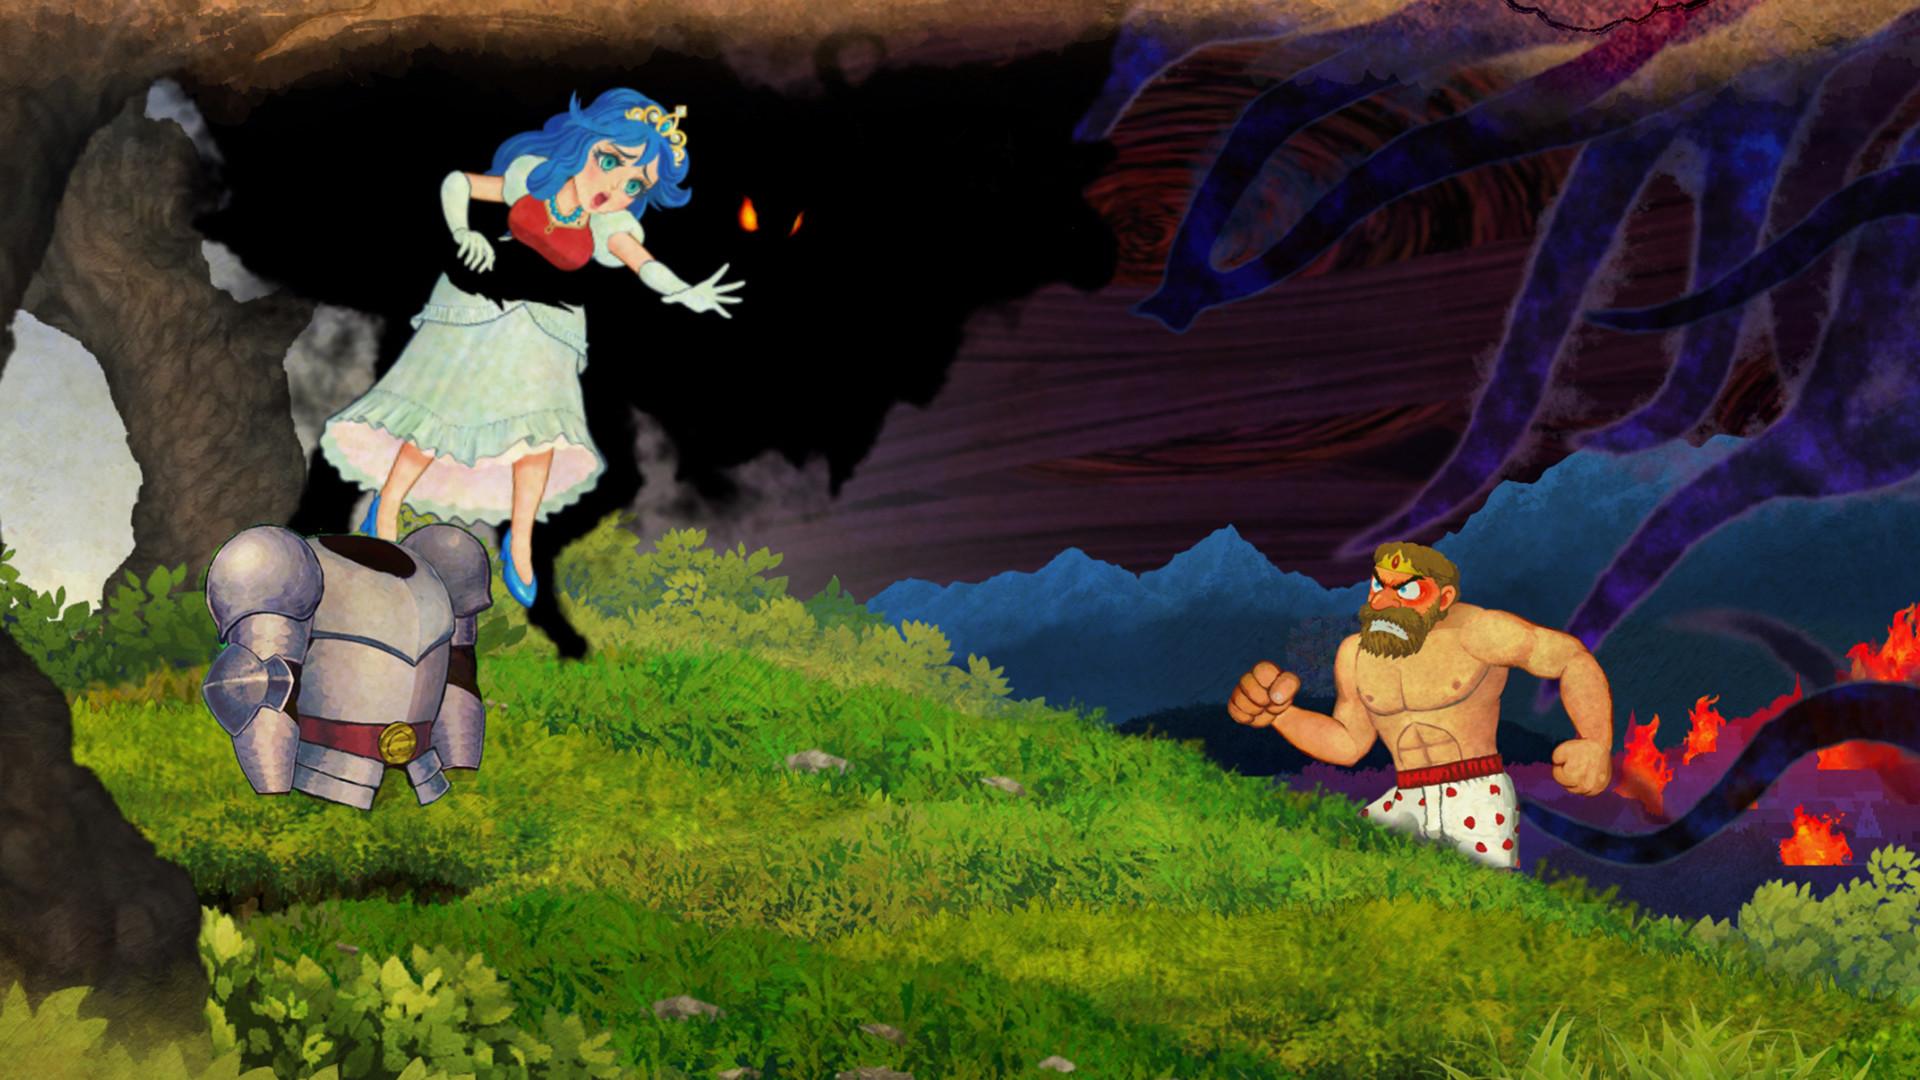 经典回归 魔界村-重制版/Ghosts n Goblins Resurrection(Build.6580247+预约特典)插图1